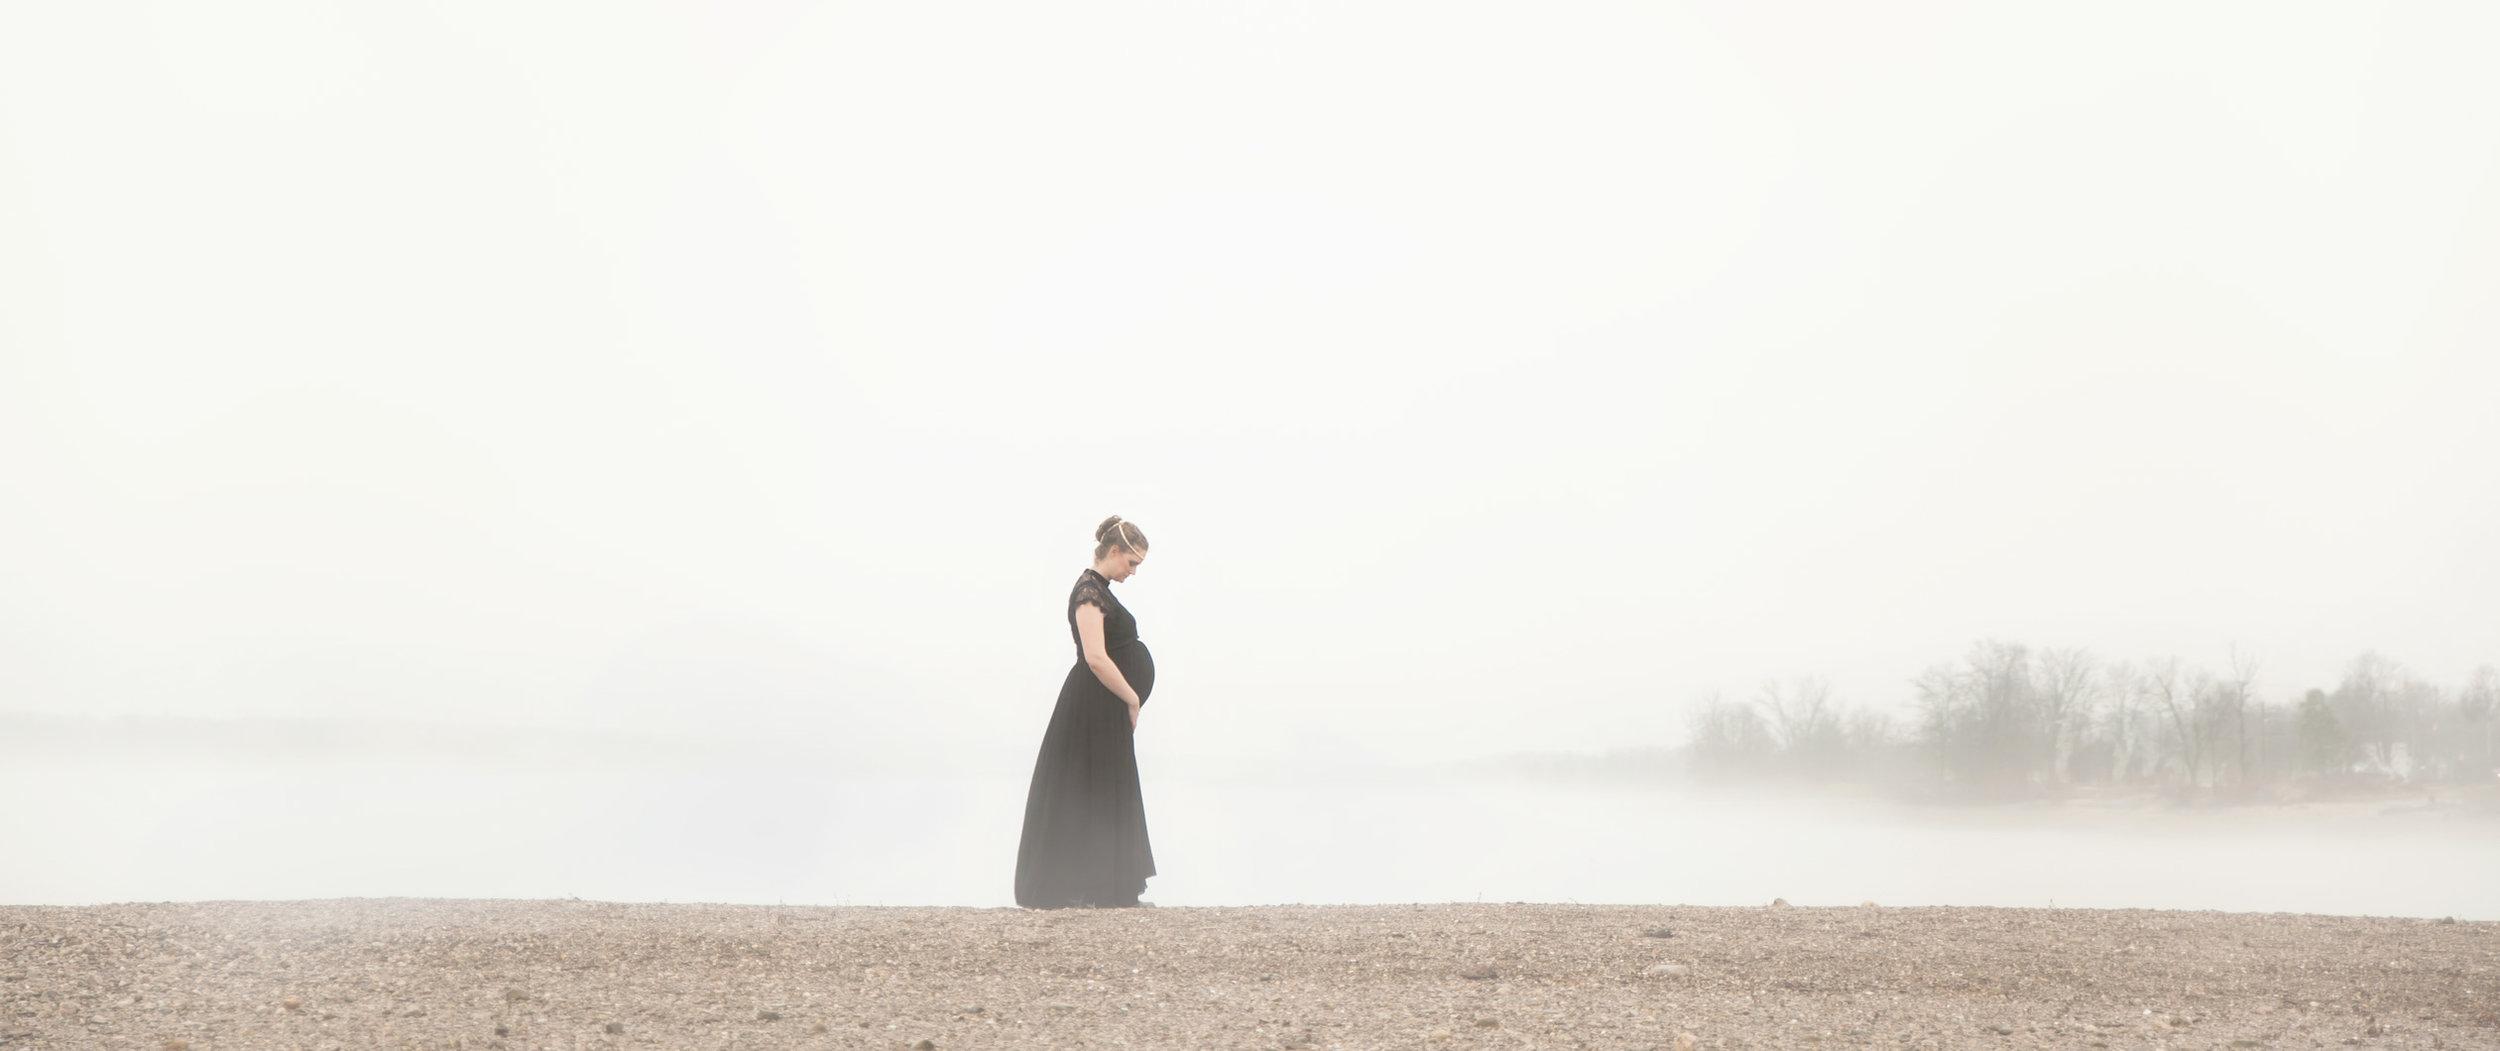 best-maternity-photographer-columbus-ohio-big-fish-stories.jpg